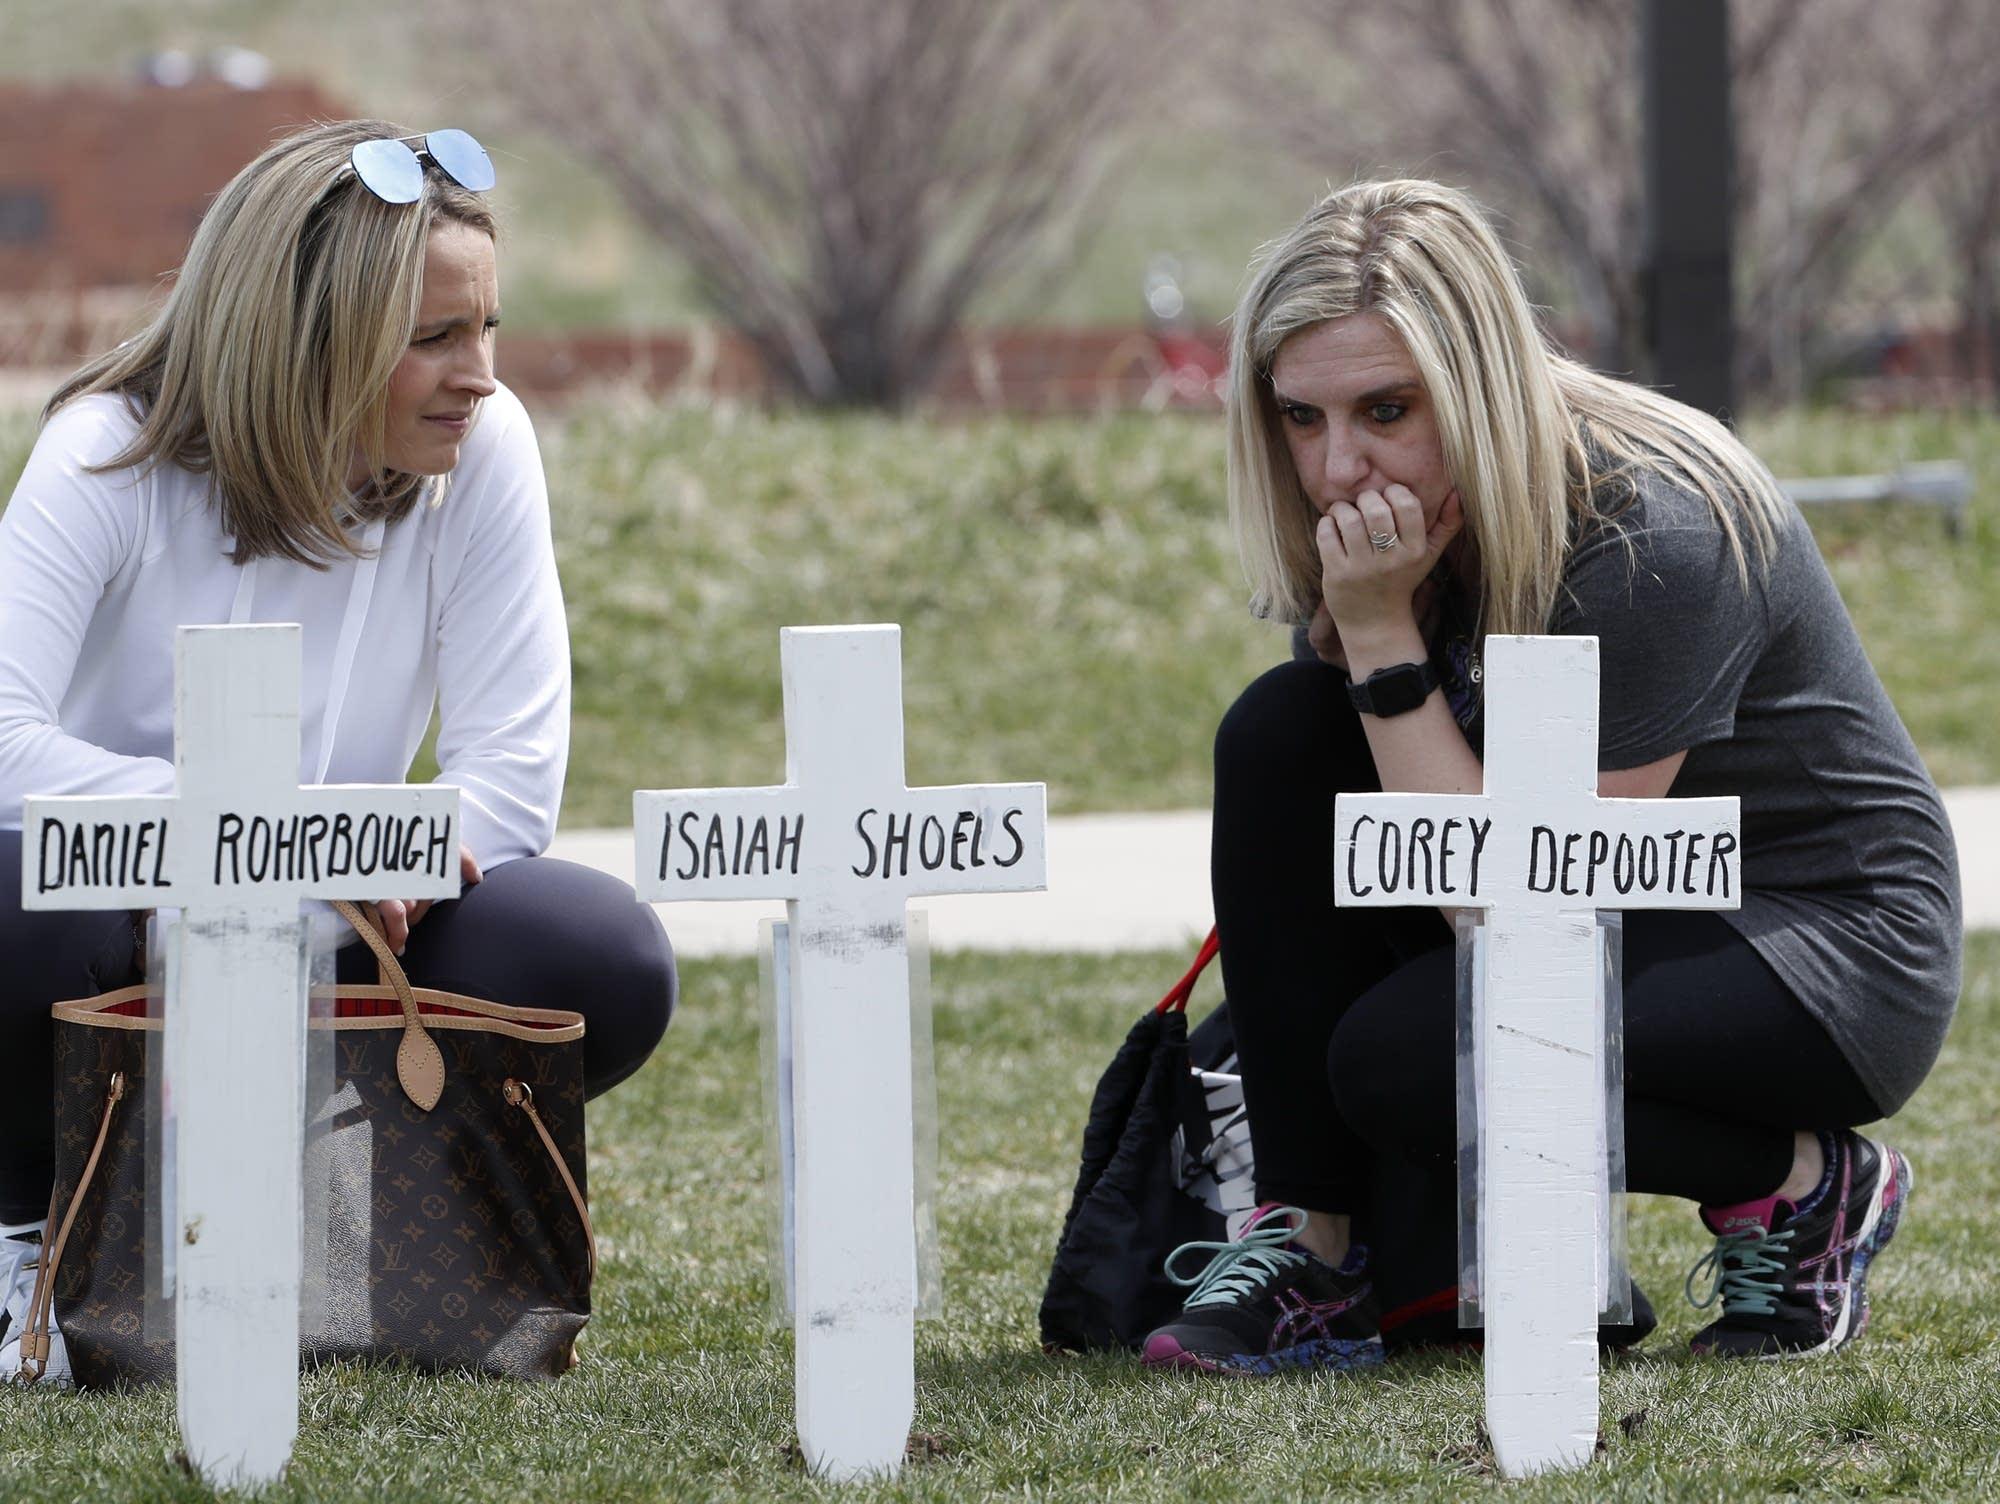 Cassandra Sandusky (right), a graduate of Columbine High School